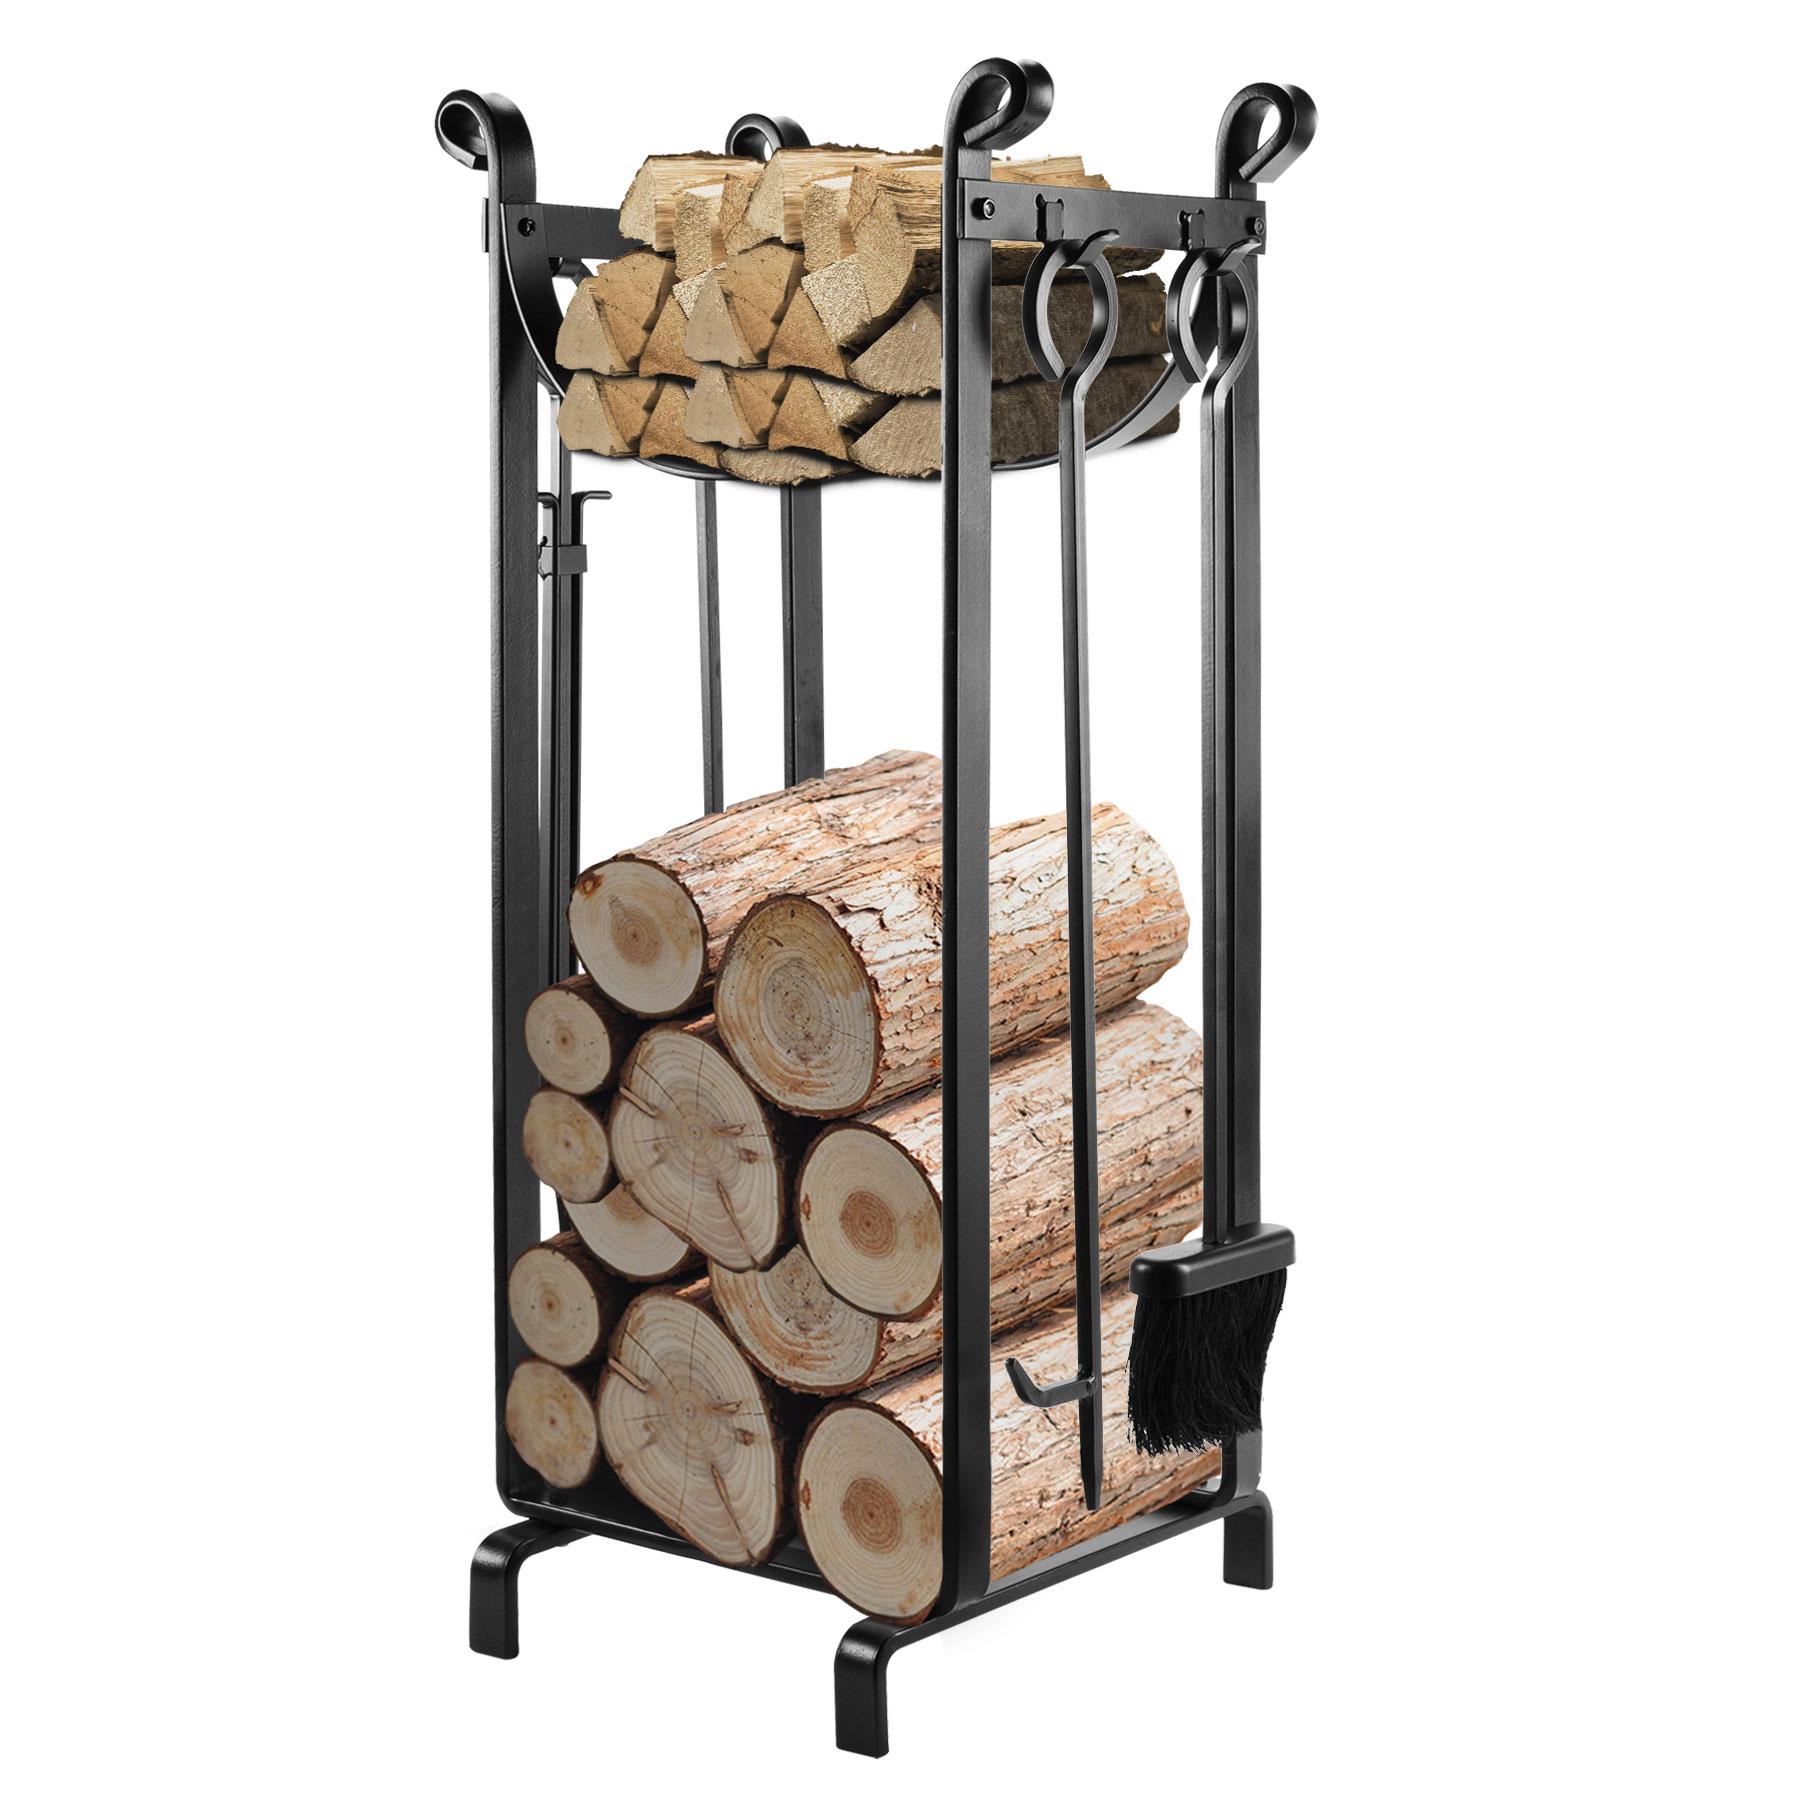 Banyan Imports Fireplace Log Rack With 4 Tools Firewood Storage